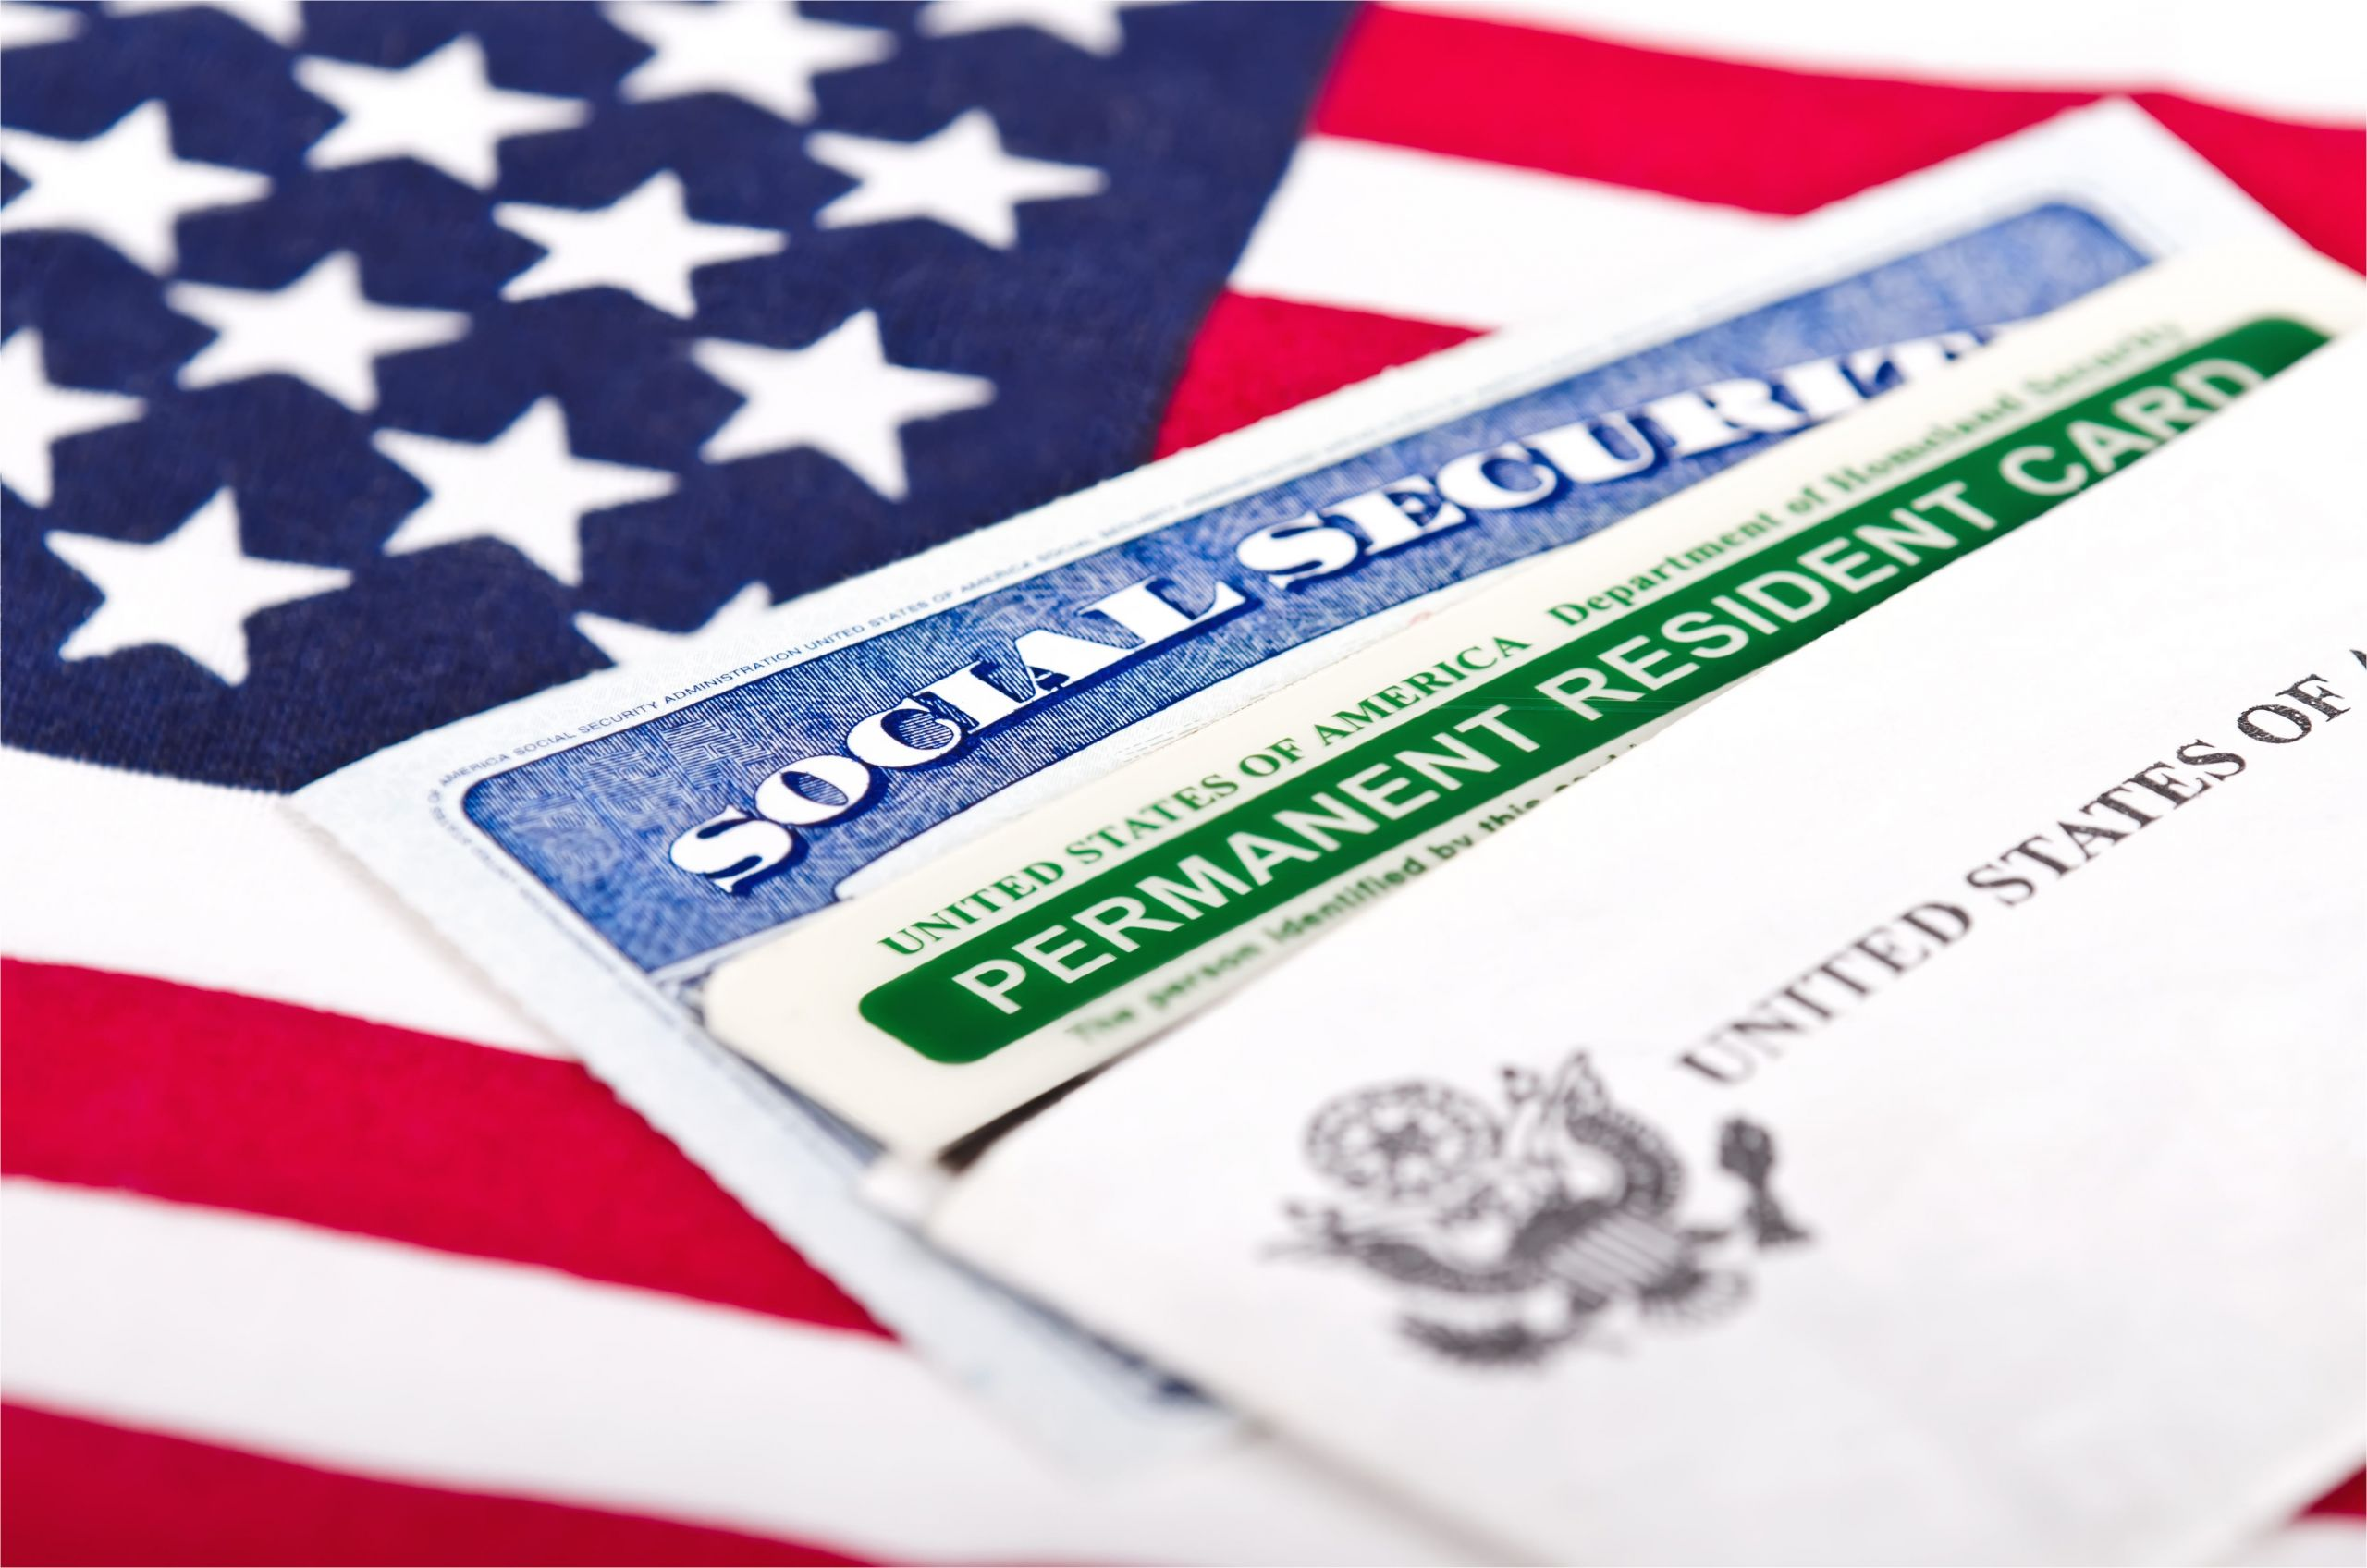 green card documents db36efb21eaee60aa43ec7a2b62973f0fb45258dc70db26adc8616083bc267be jpg